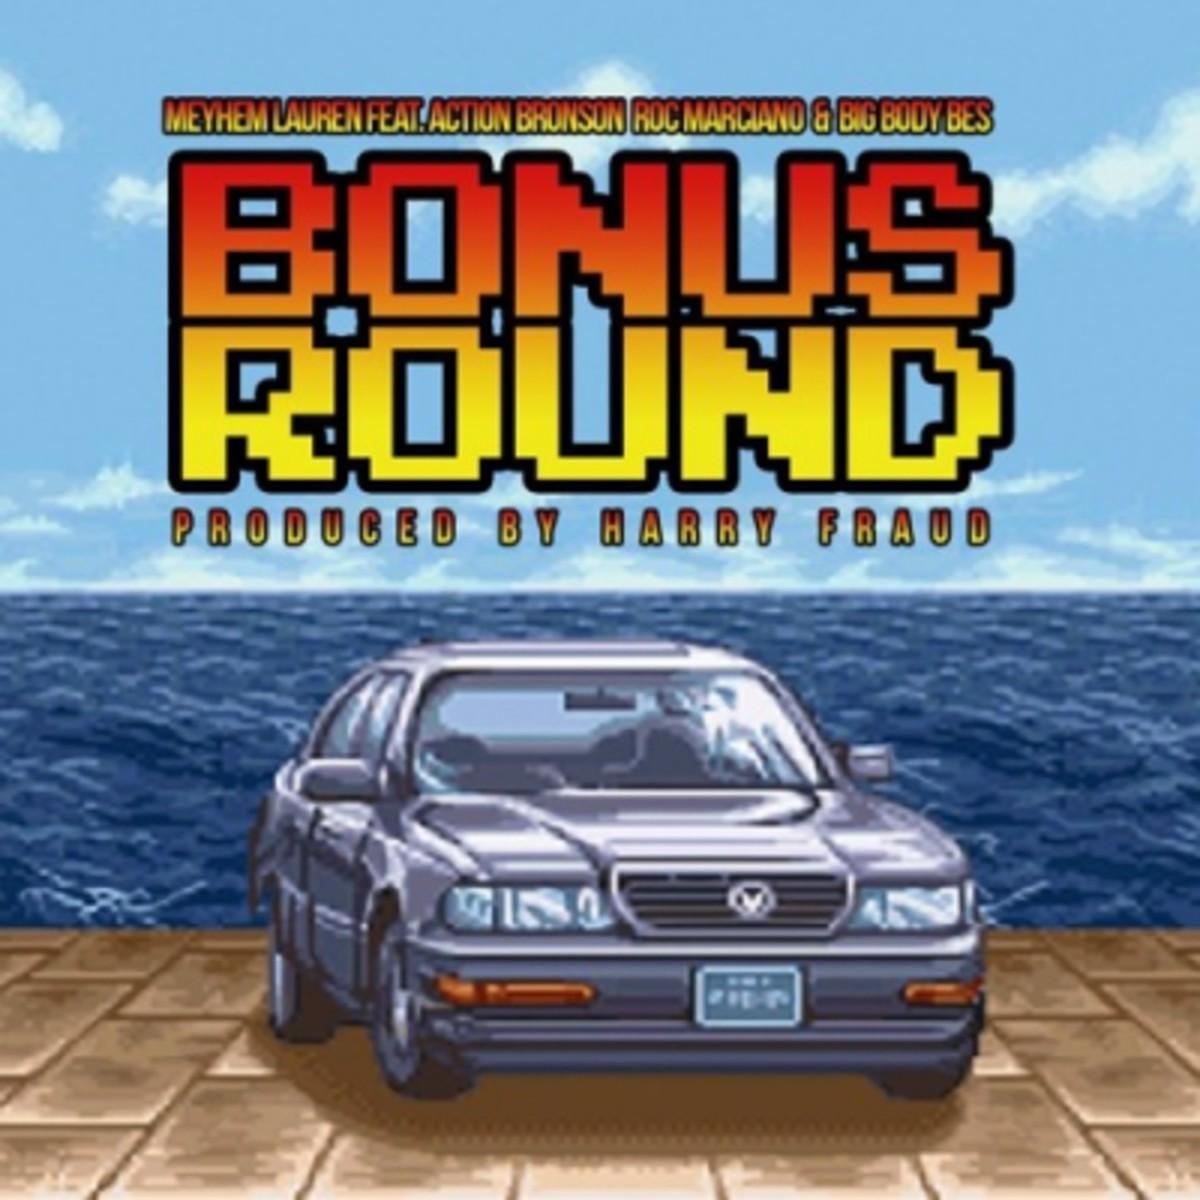 meyhem-lauren-bonus-round.jpg